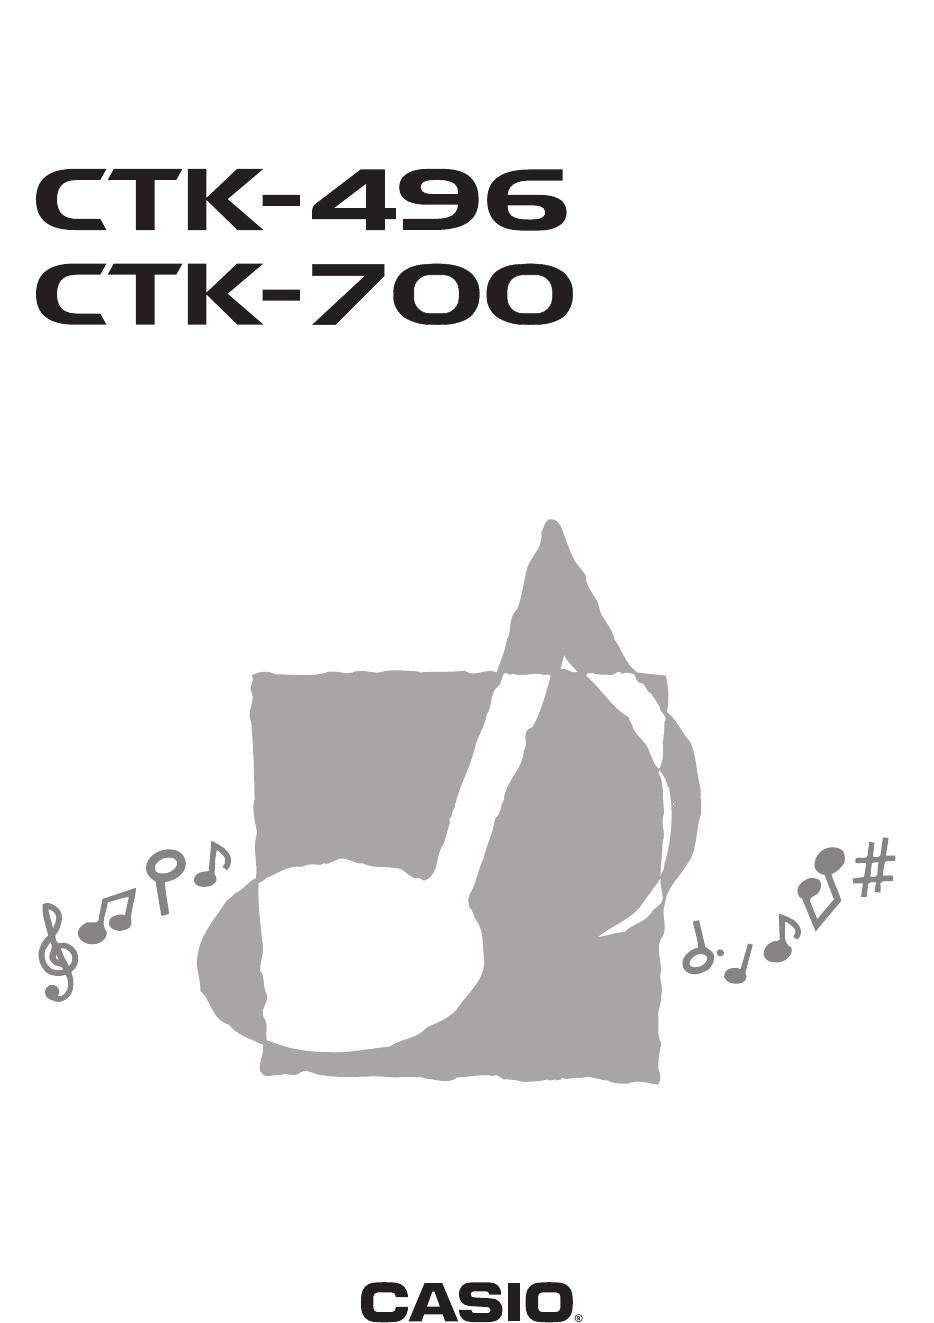 Manual Casio CTK-700 (page 1 of 45) (English)